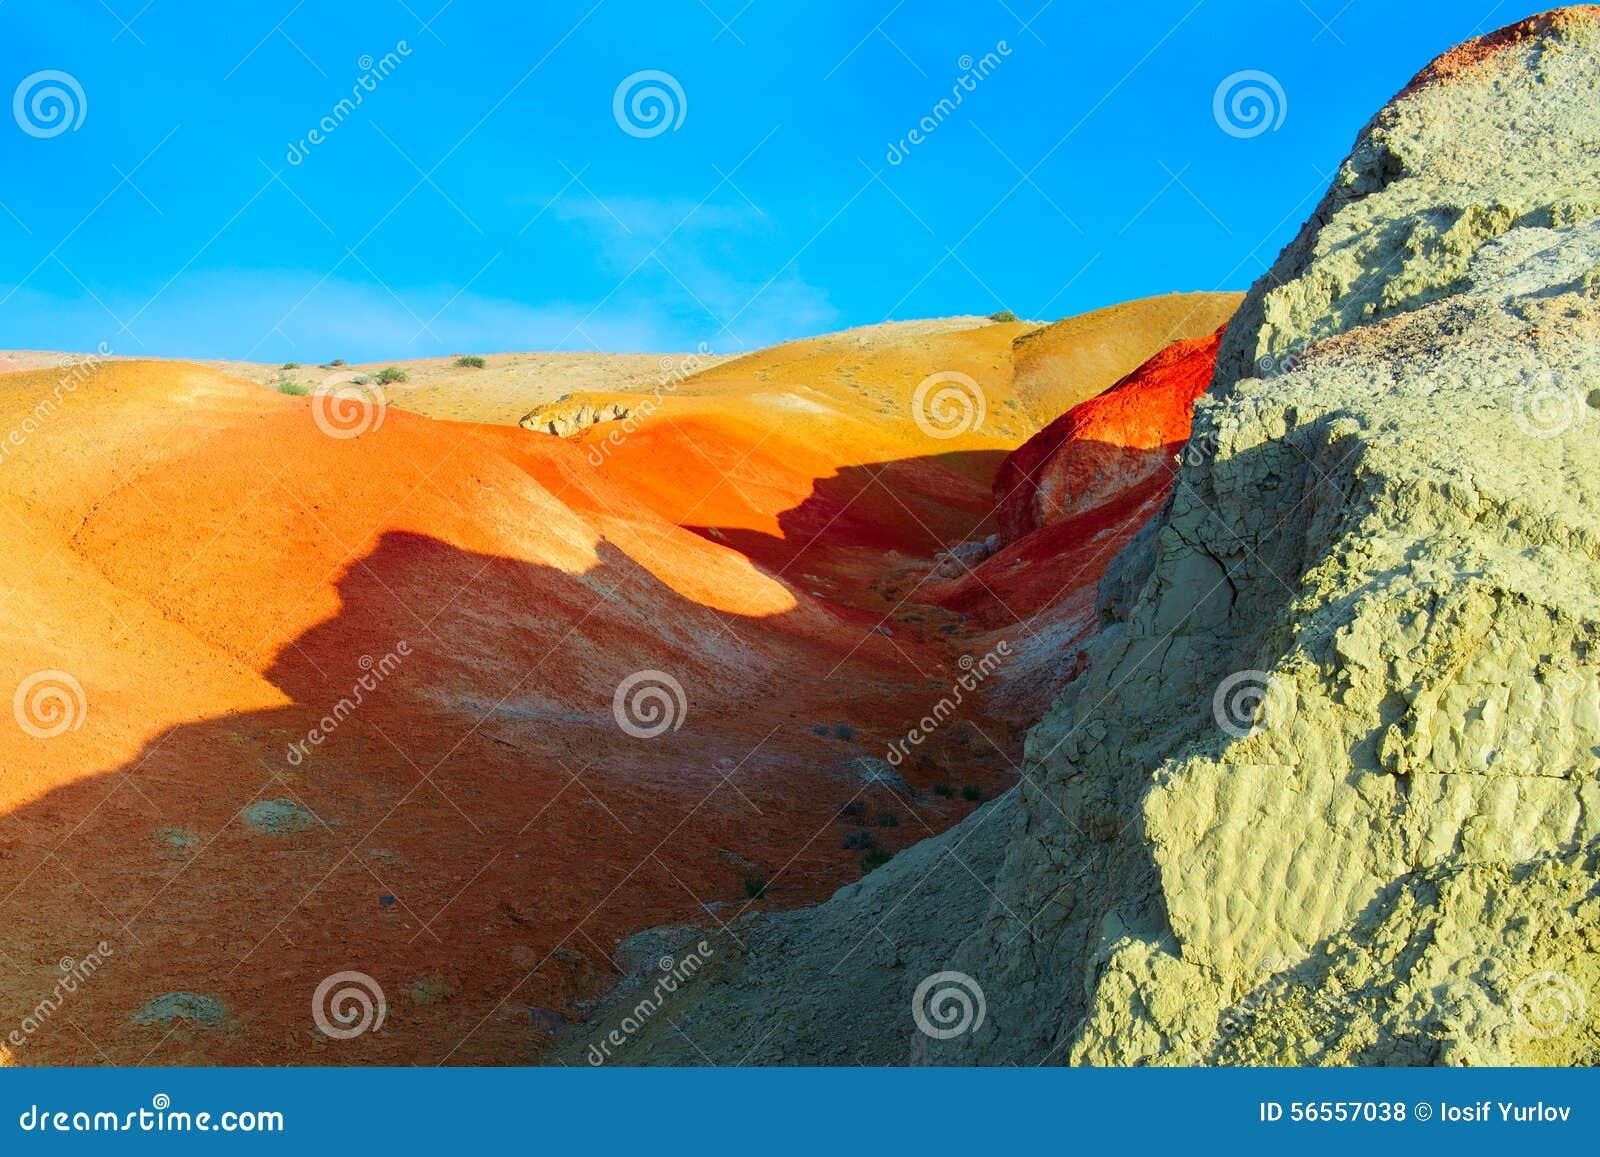 Download Χώμα χρώματος των καταθέσεων υδραργύρου σε Altai Στοκ Εικόνες - εικόνα από κόκκινος, επαρχία: 56557038